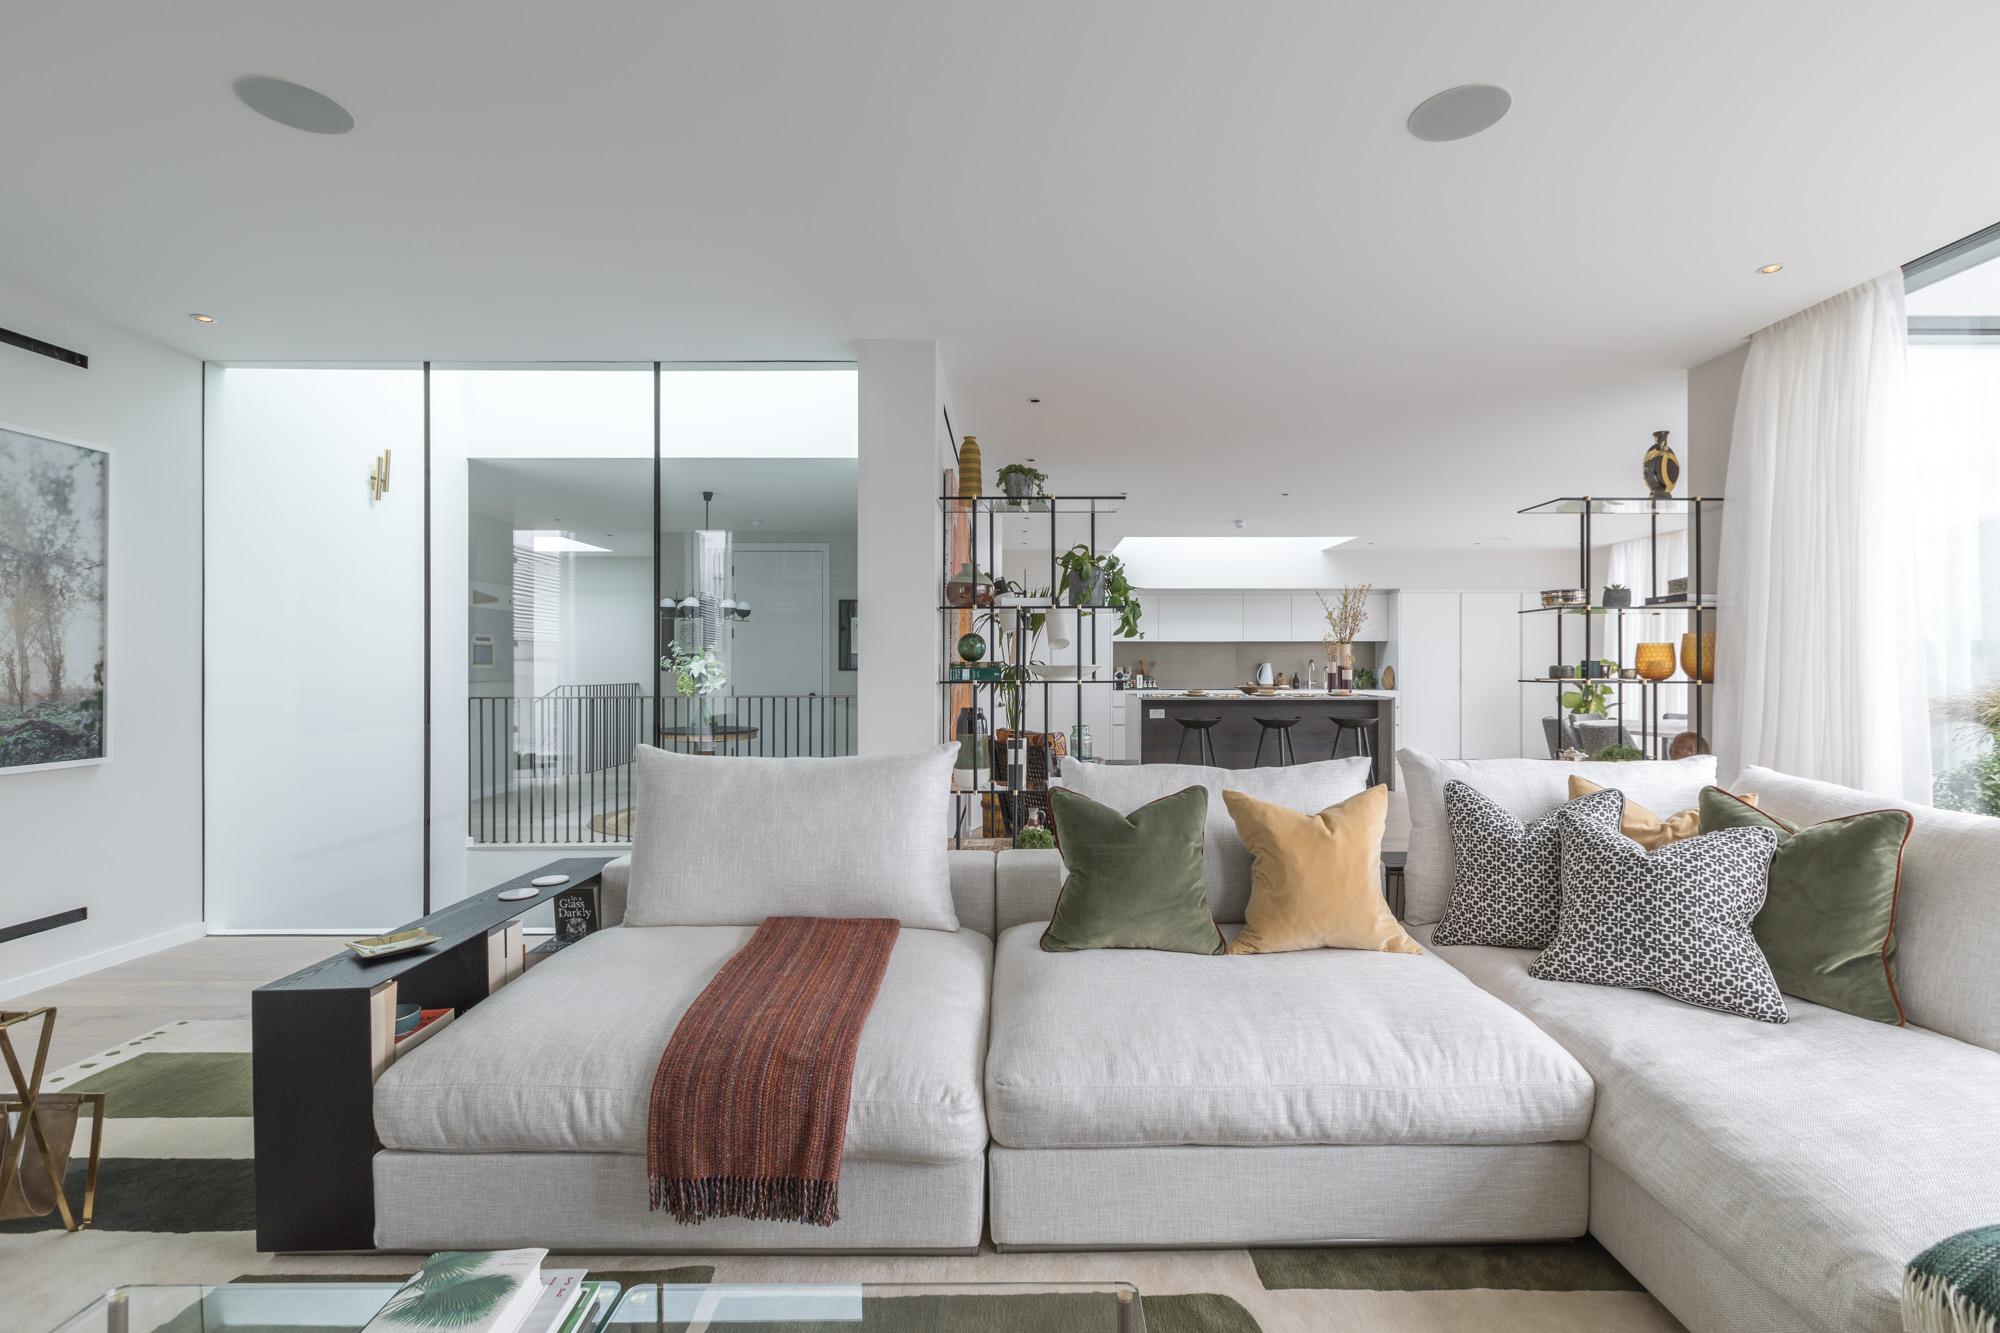 jonathan bond, interior photographer, corner settee in living room, battersea, london